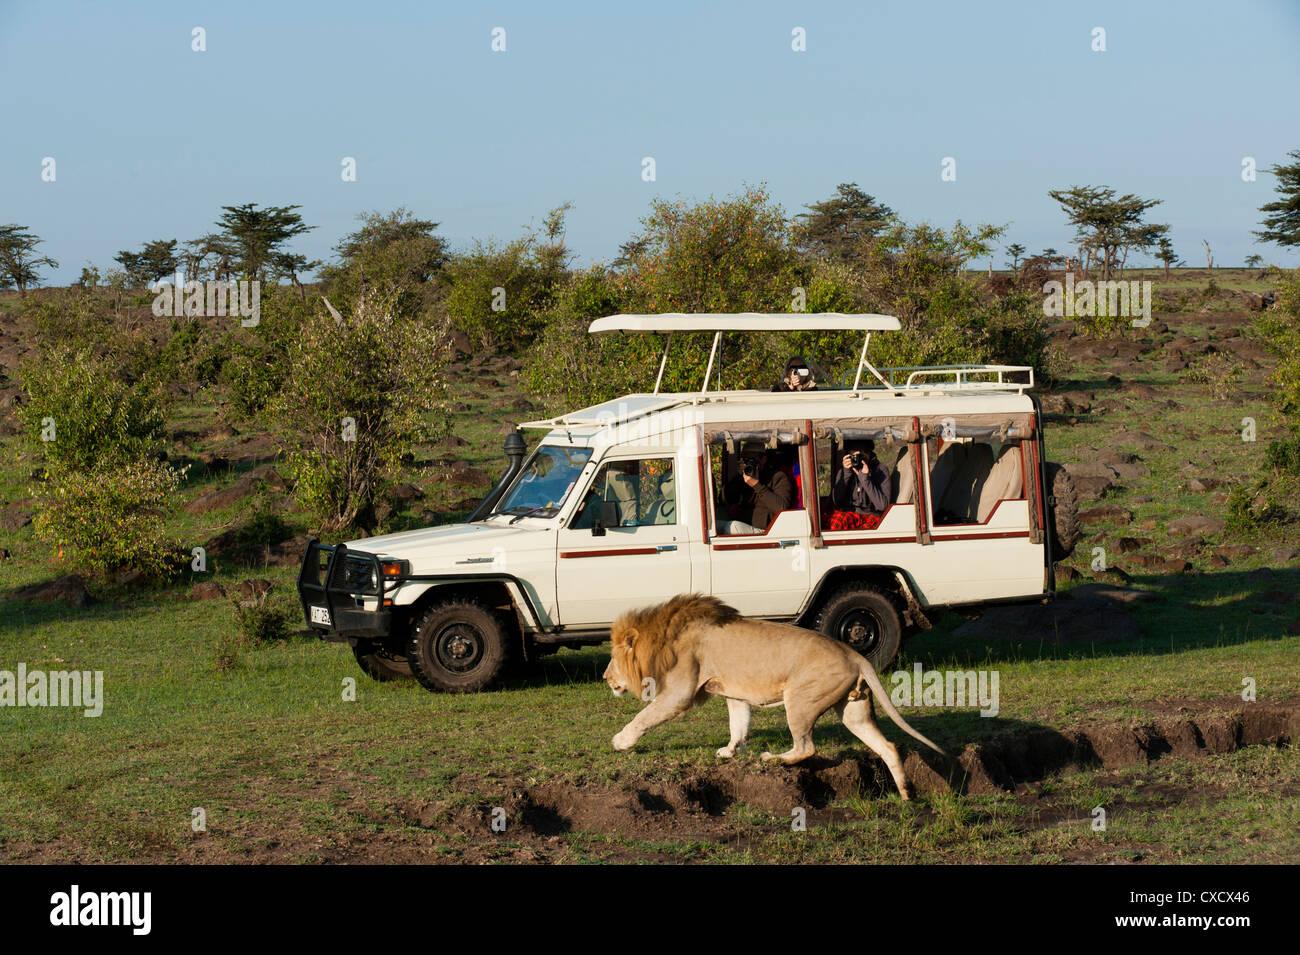 Lion (Panthera leo) e veicolo di safari, il Masai Mara, Kenya, Africa orientale, Africa Immagini Stock